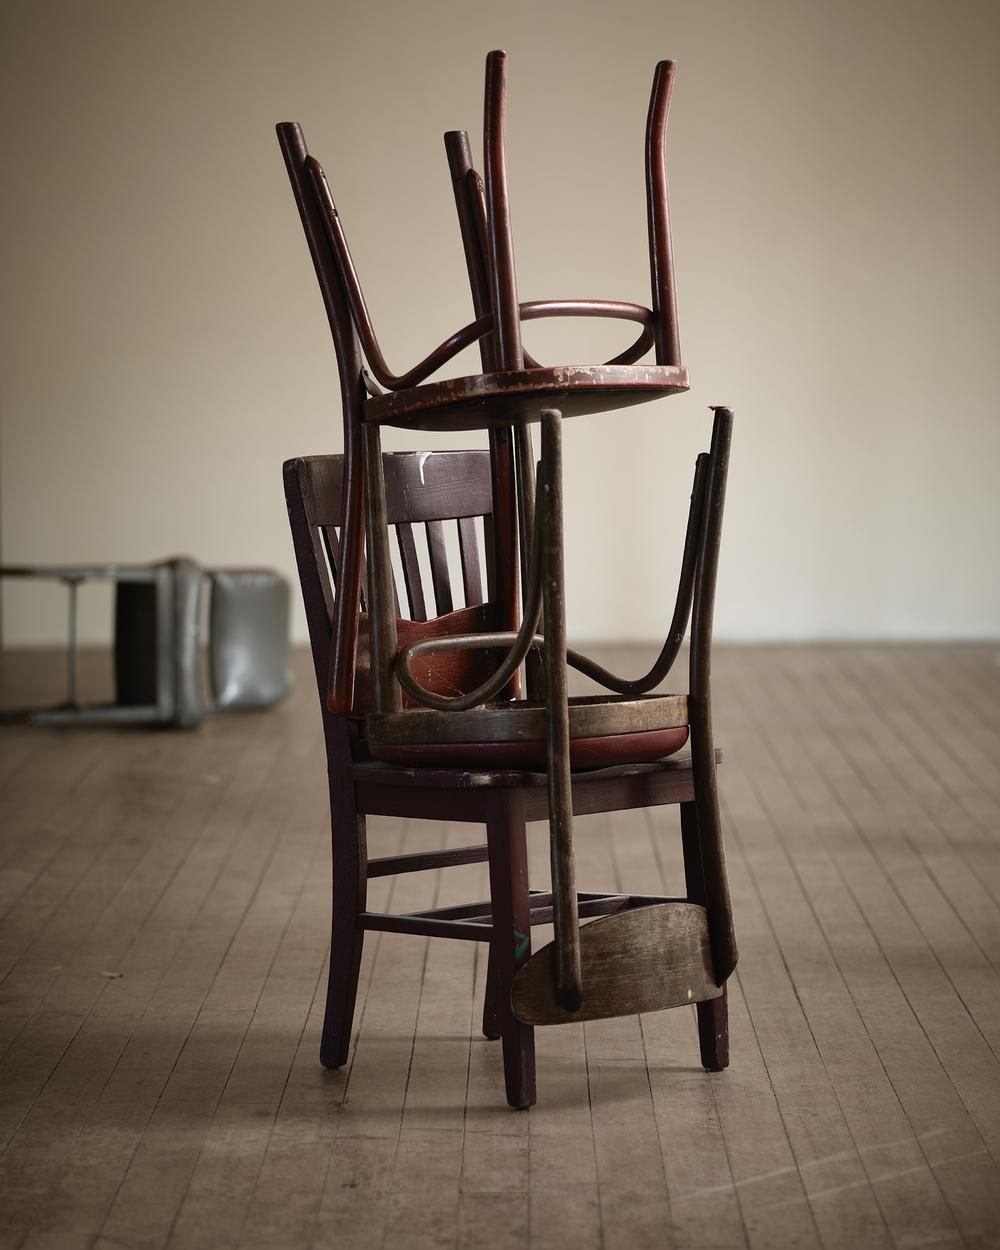 120215_Headlands_Chairs_124r.jpg